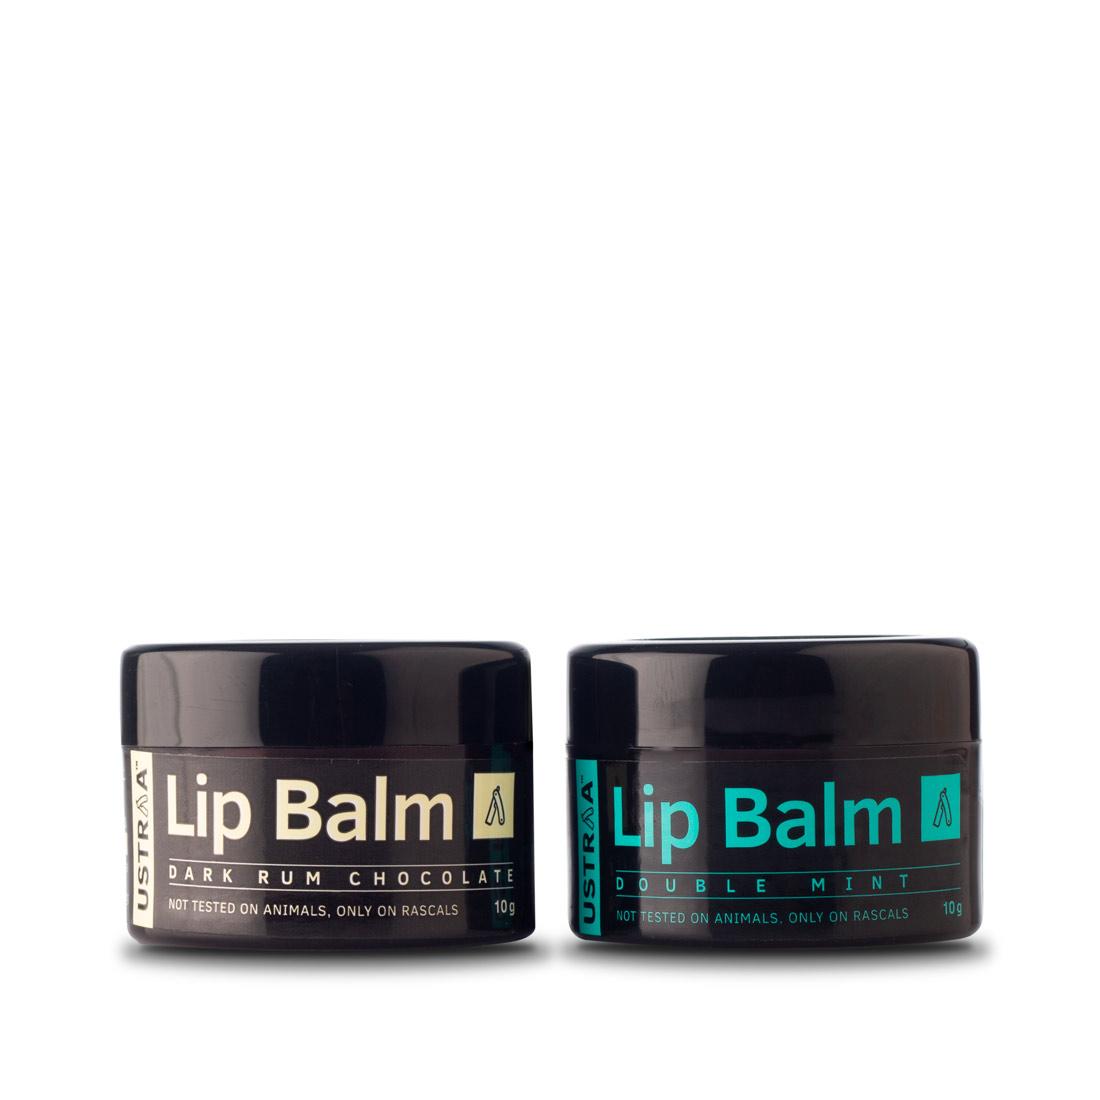 Ustraa Lip Balm (Double Mint & Dark Rum Chocolate) - Set of 2 (10gm)